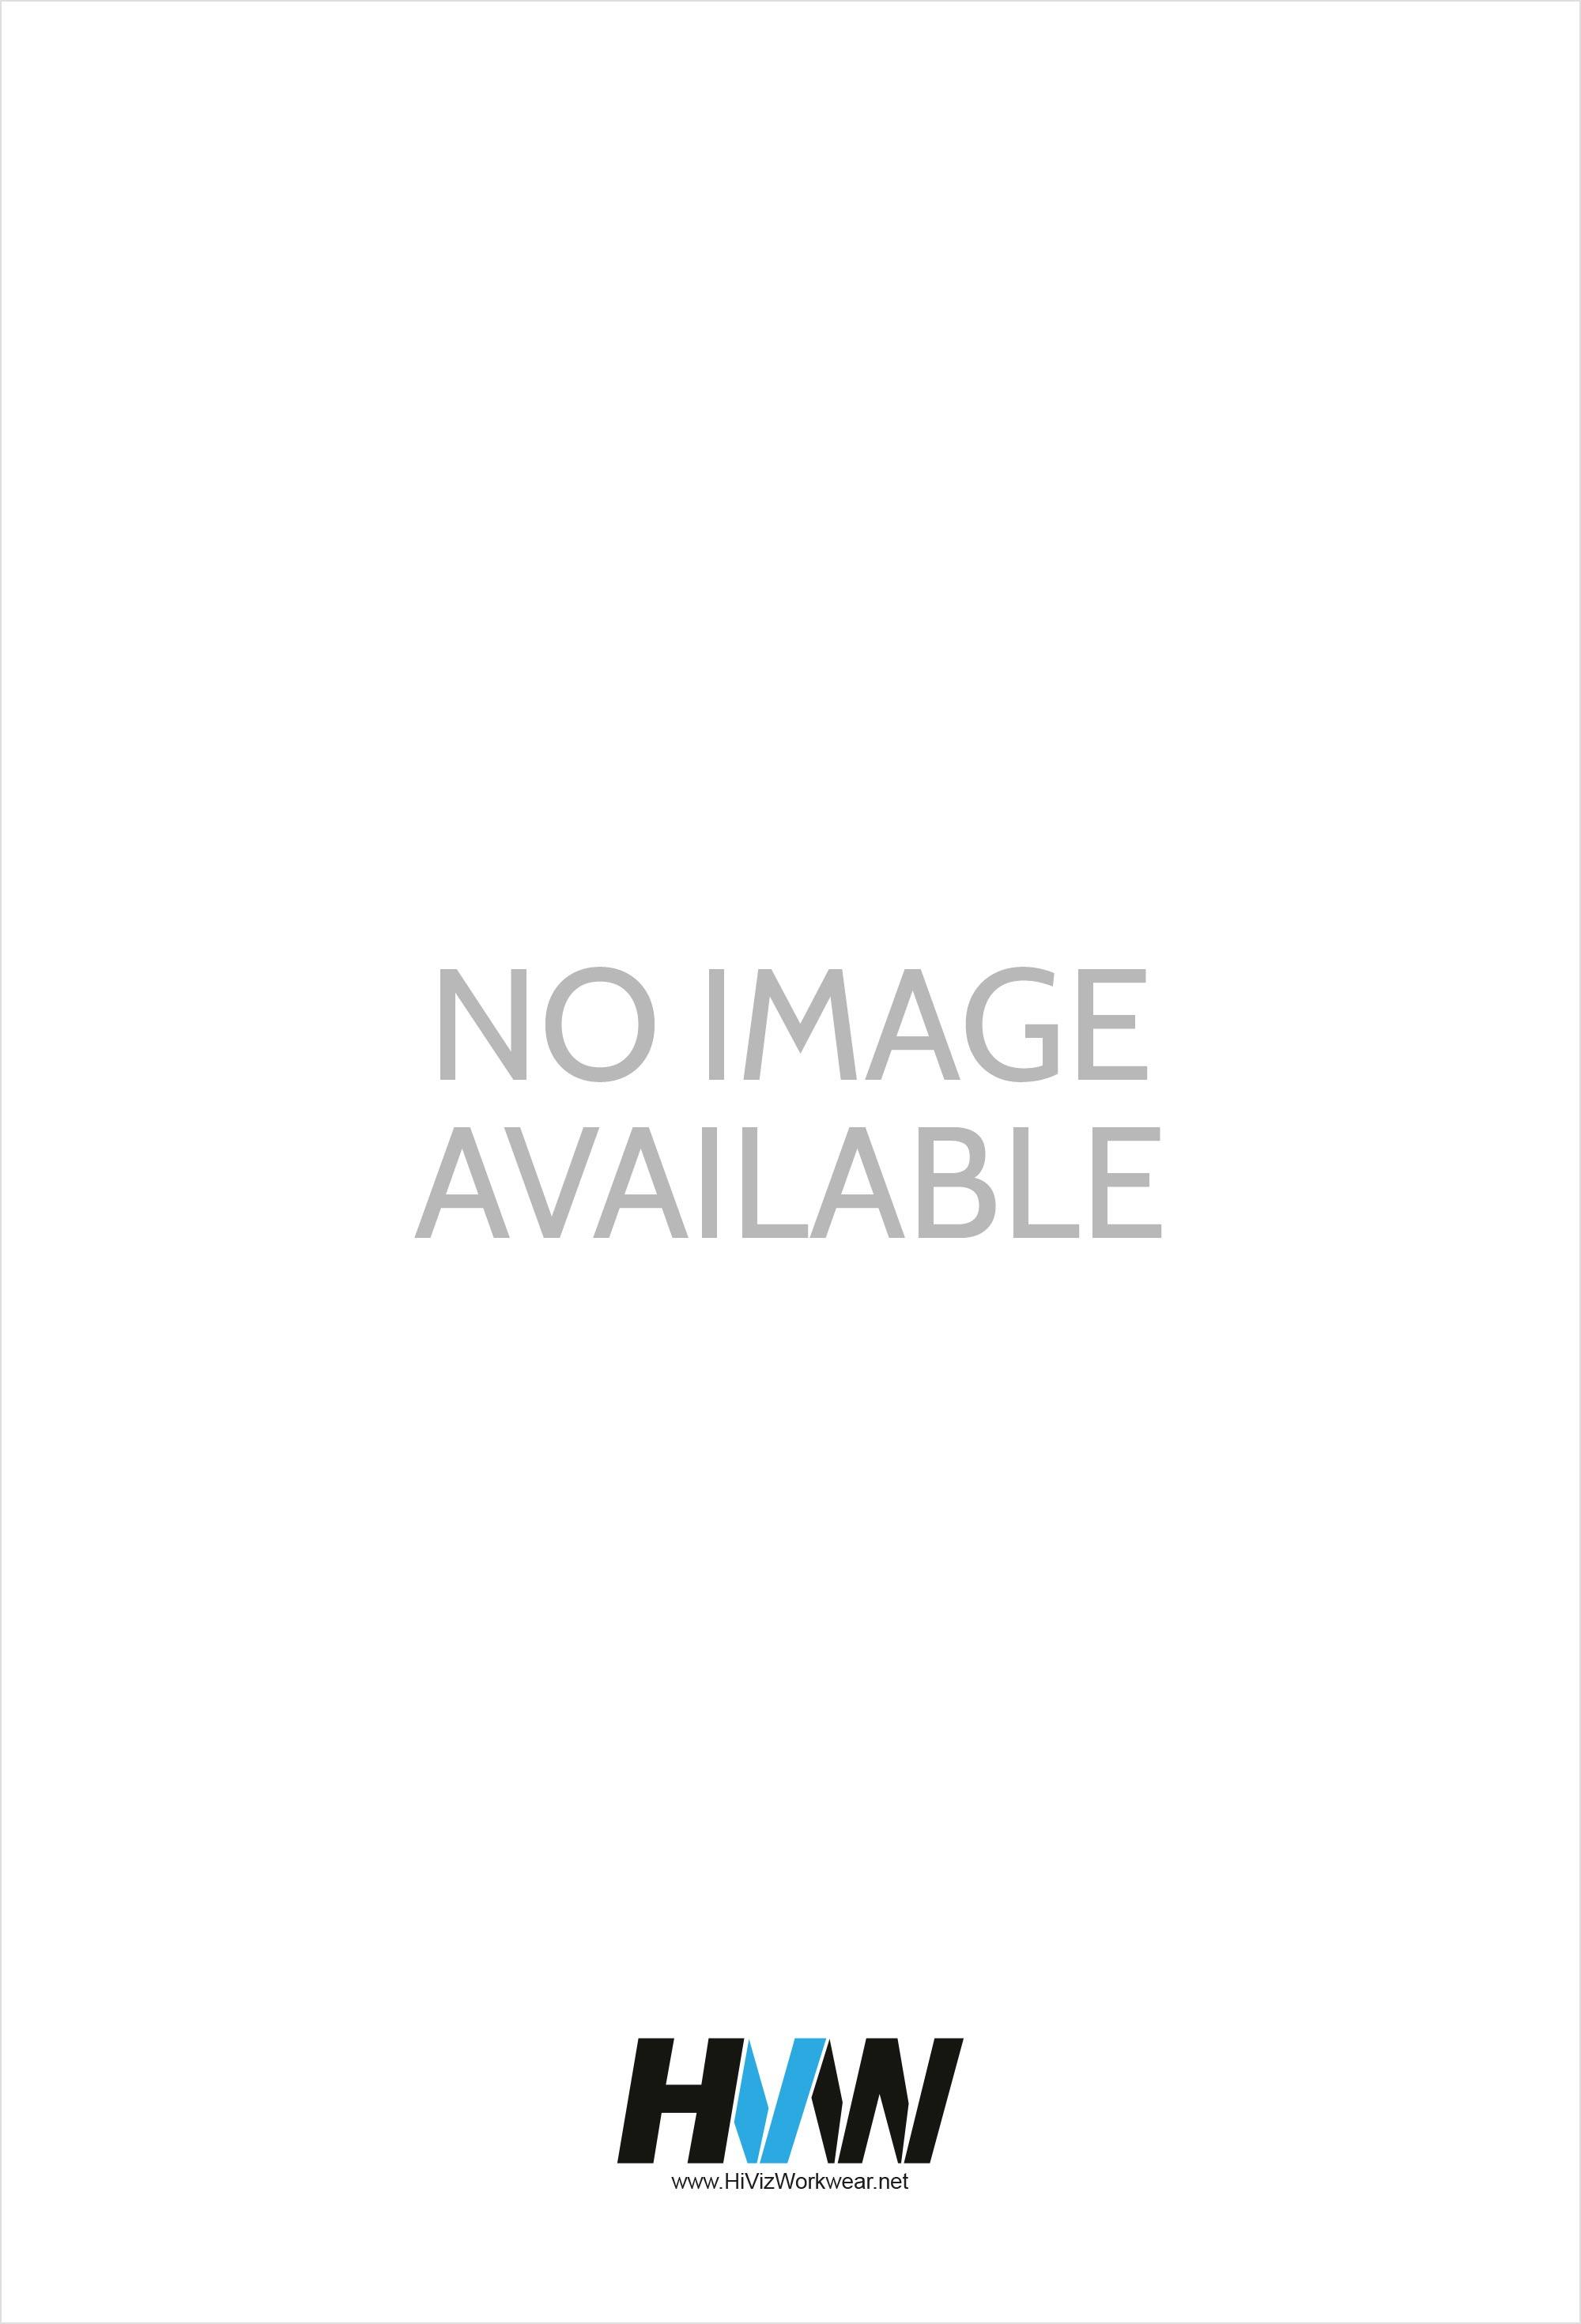 AWD is Hoods JH005 Girlie LongLine Hooded Sweatshirt (Xsmall to Xlarge)